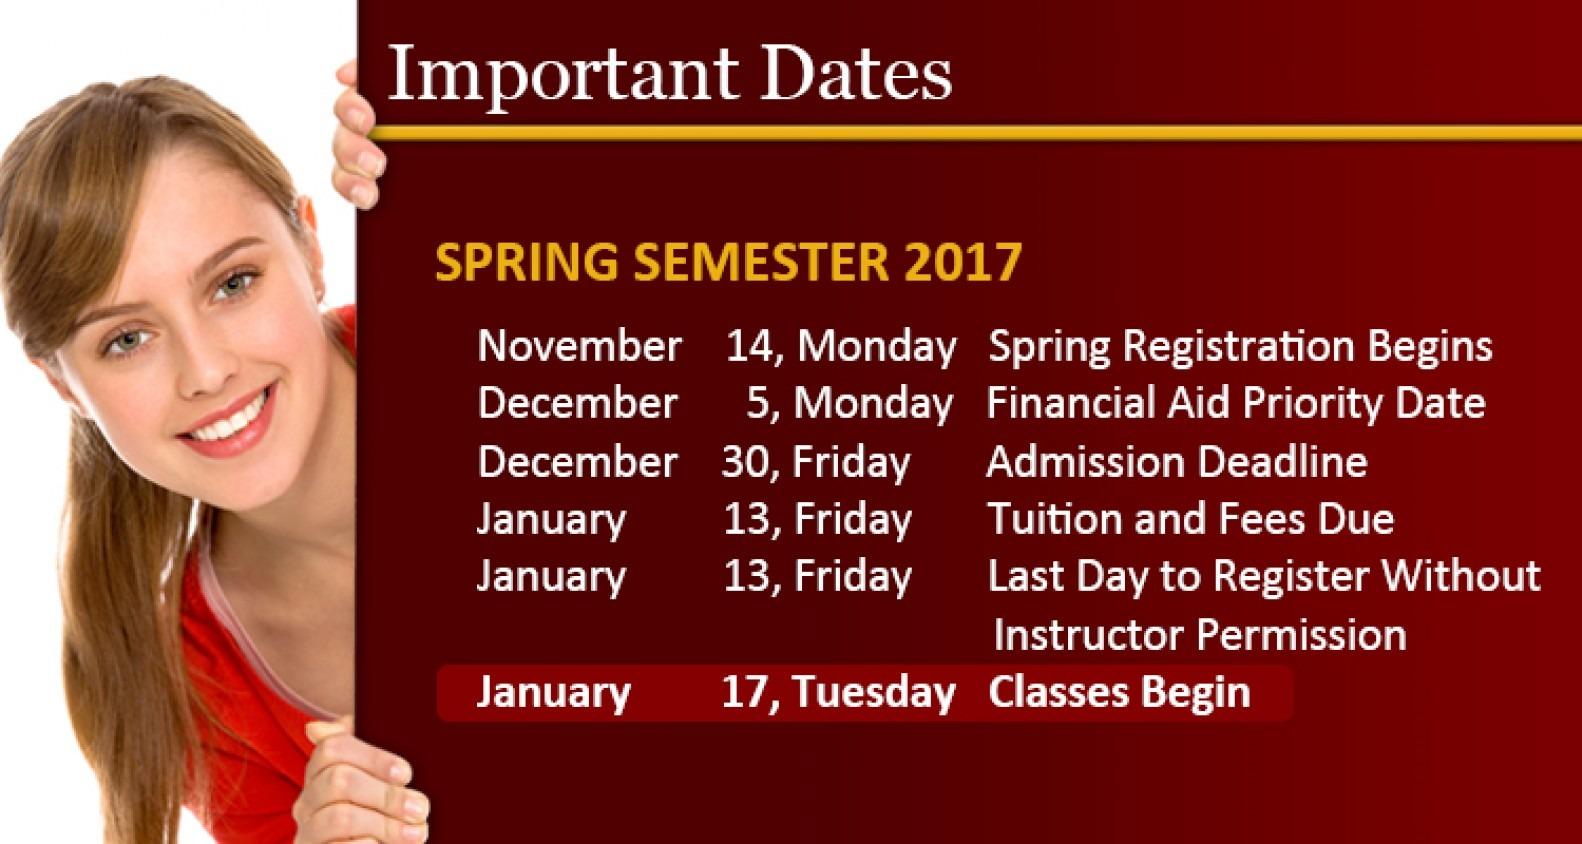 Girl peeking around sign showing upcoming academic dates for Spring 2017 semester